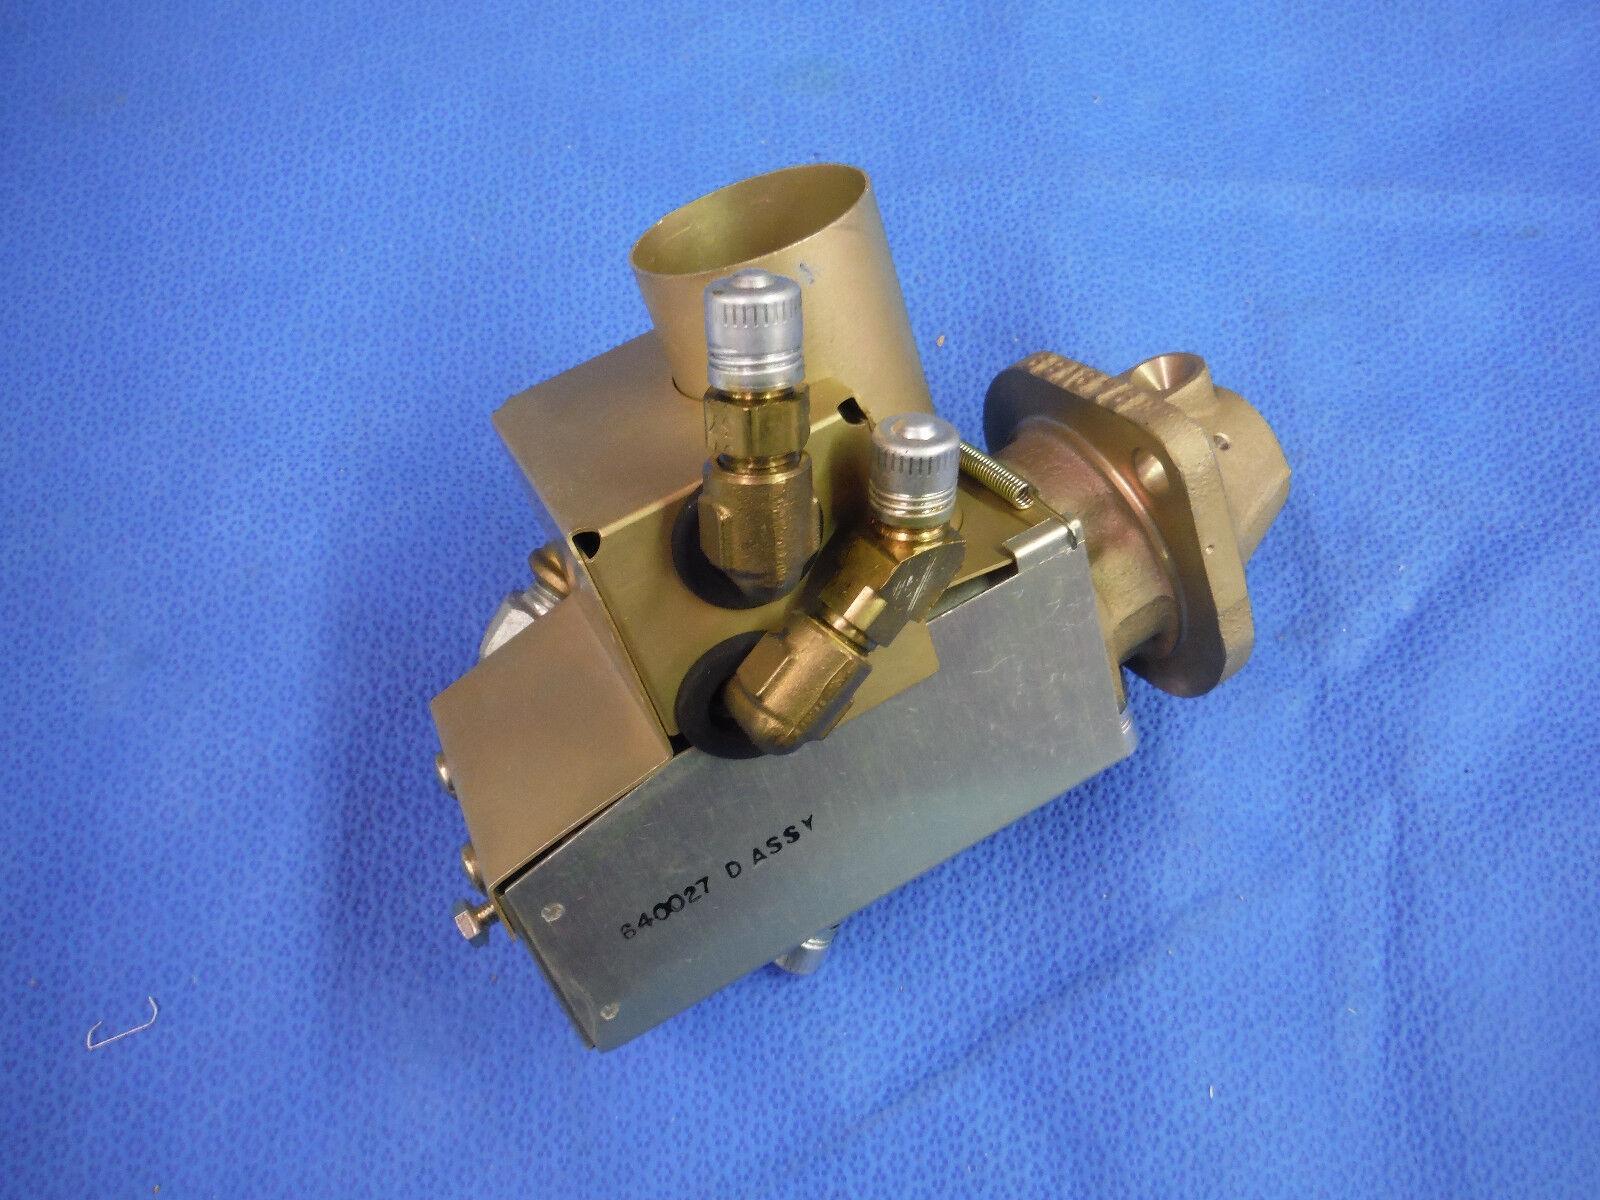 Continental ( Tcm ) Kraftstoff Pumpe Neu P/n 646212-23a3 646212-23a3 646212-23a3 (1115-17) ffb1b9